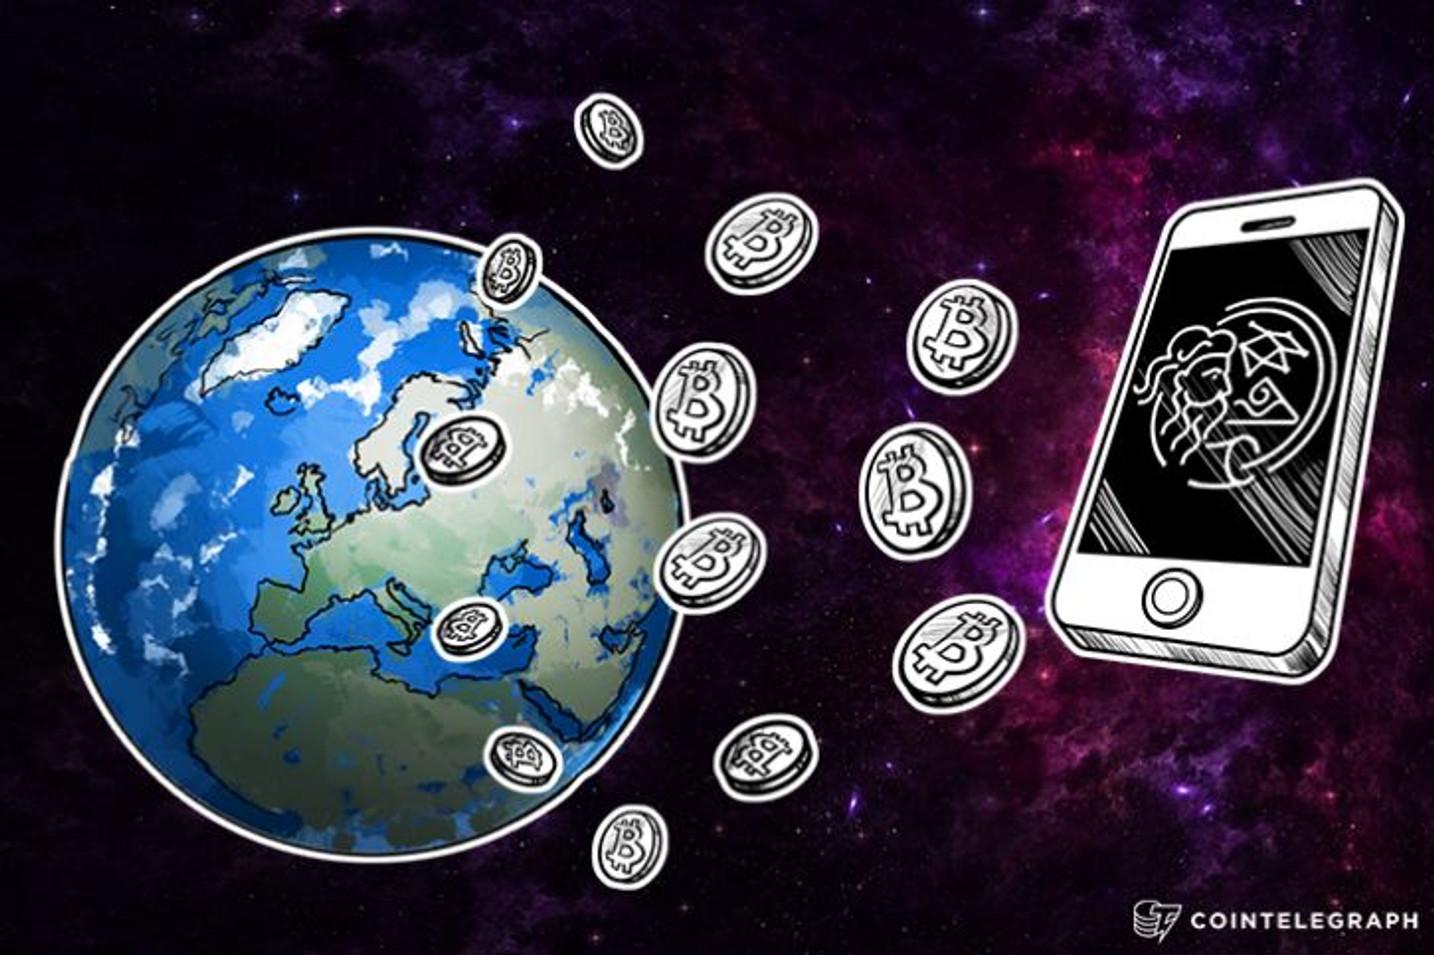 Platite bitkoinima na bilo kom NFC point-of-sale terminalu na planeti preko Plutus-a